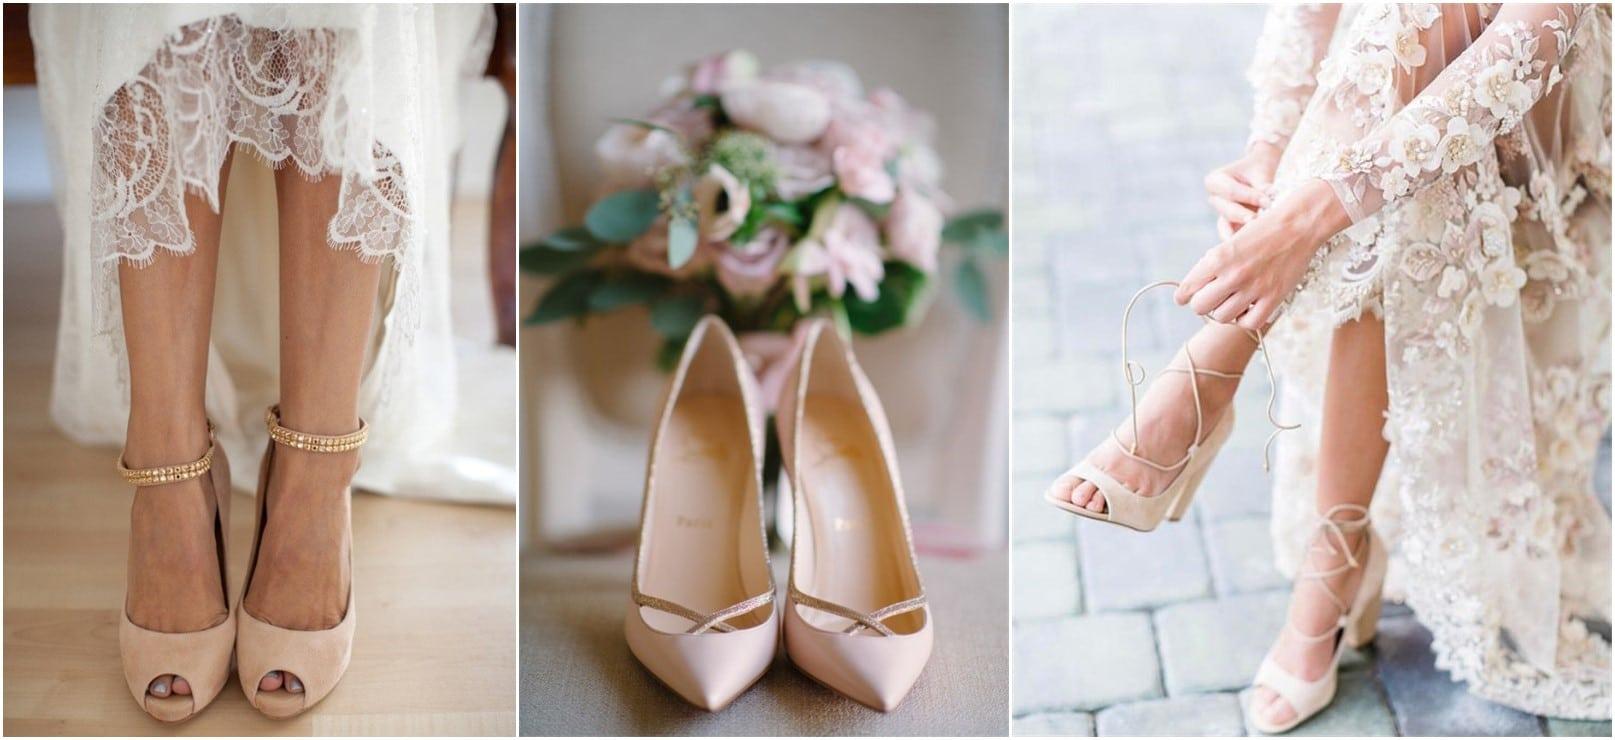 chaussures de mariée nude